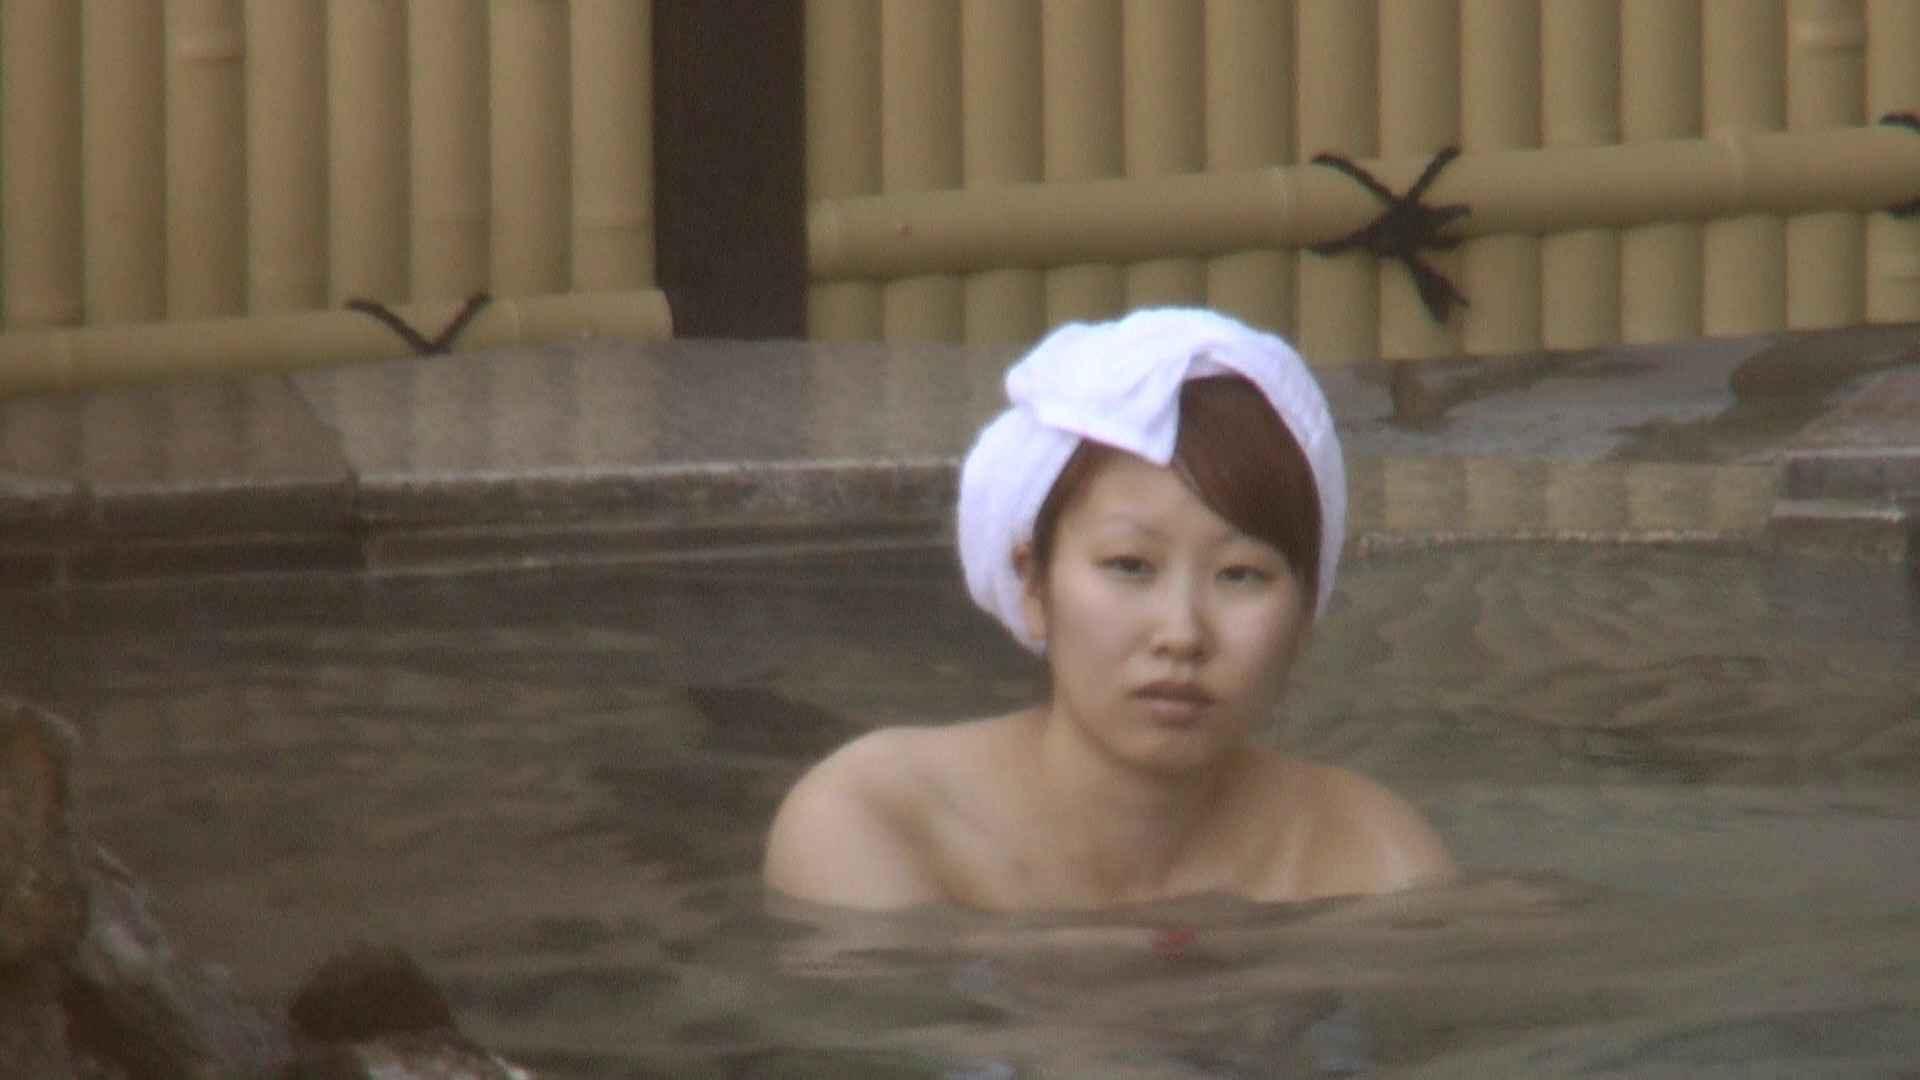 Aquaな露天風呂Vol.210 OL女体   露天  49連発 16